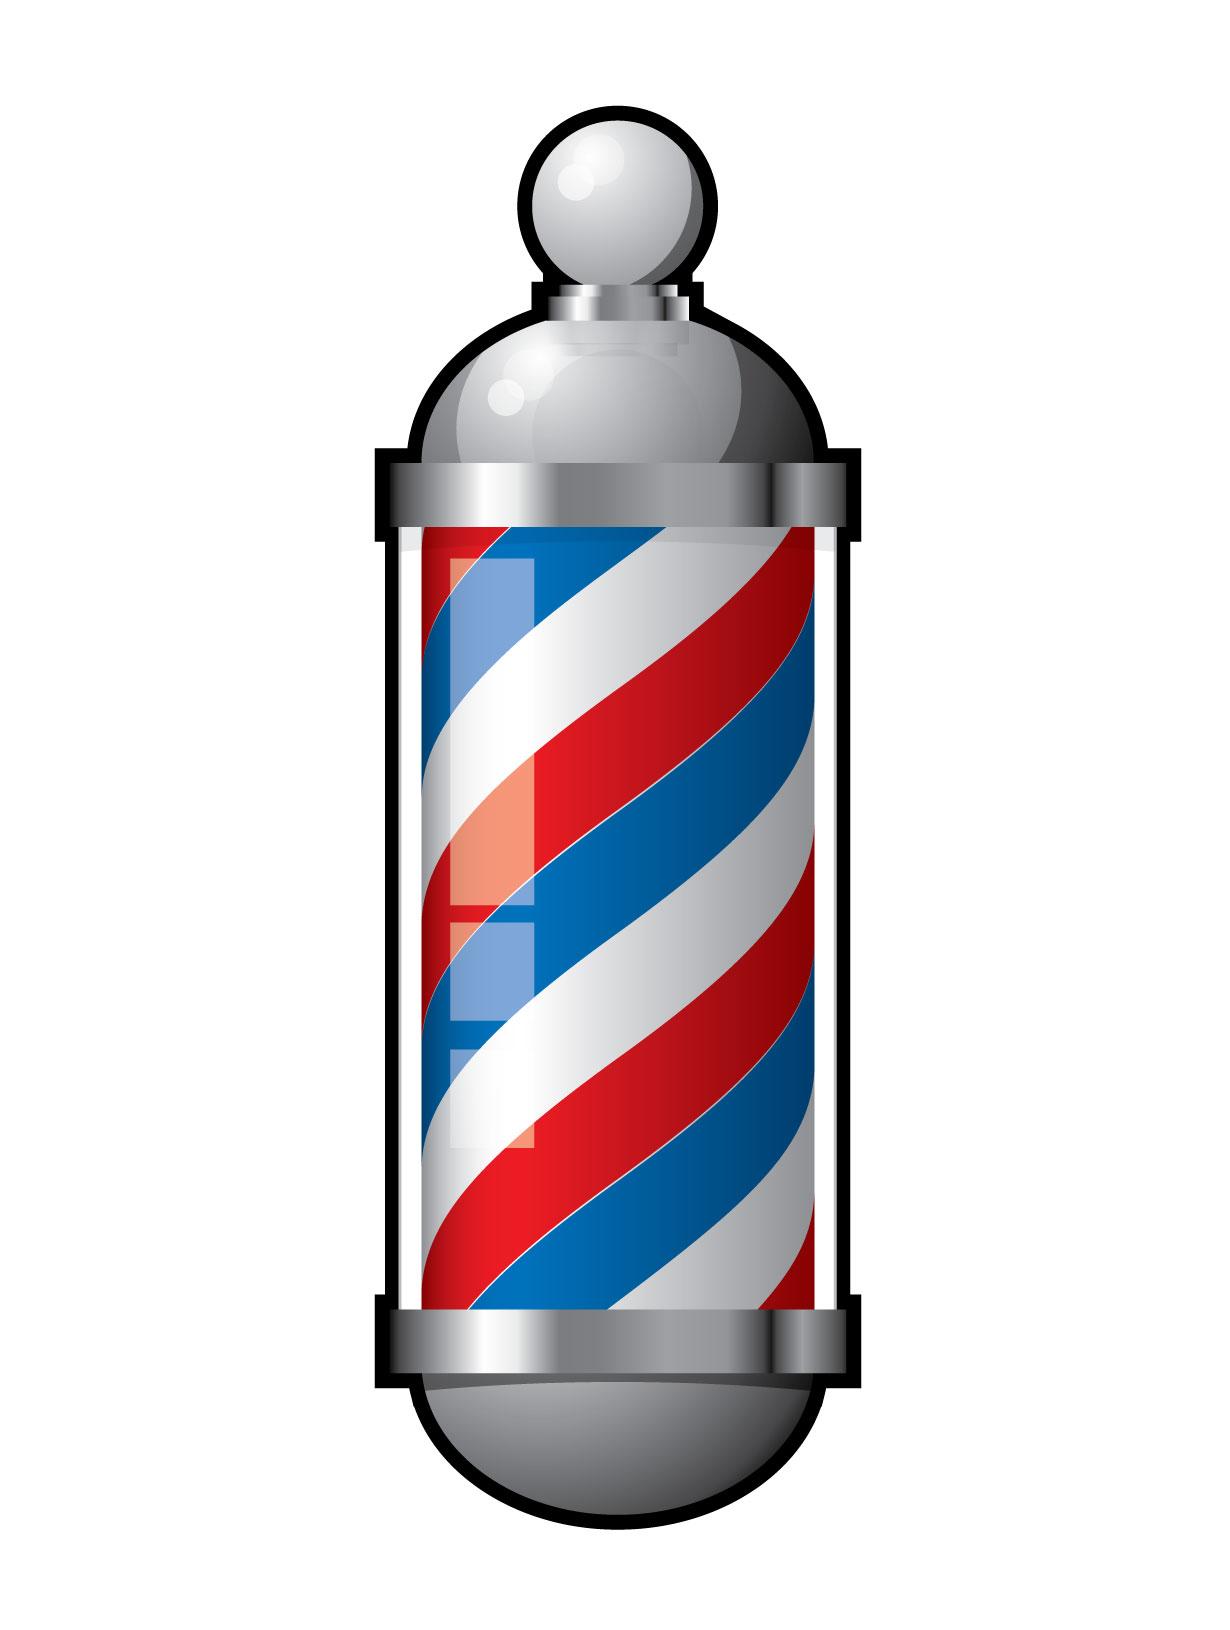 Barber Shop Pole | Free Download Clip Art | Free Clip Art | on .